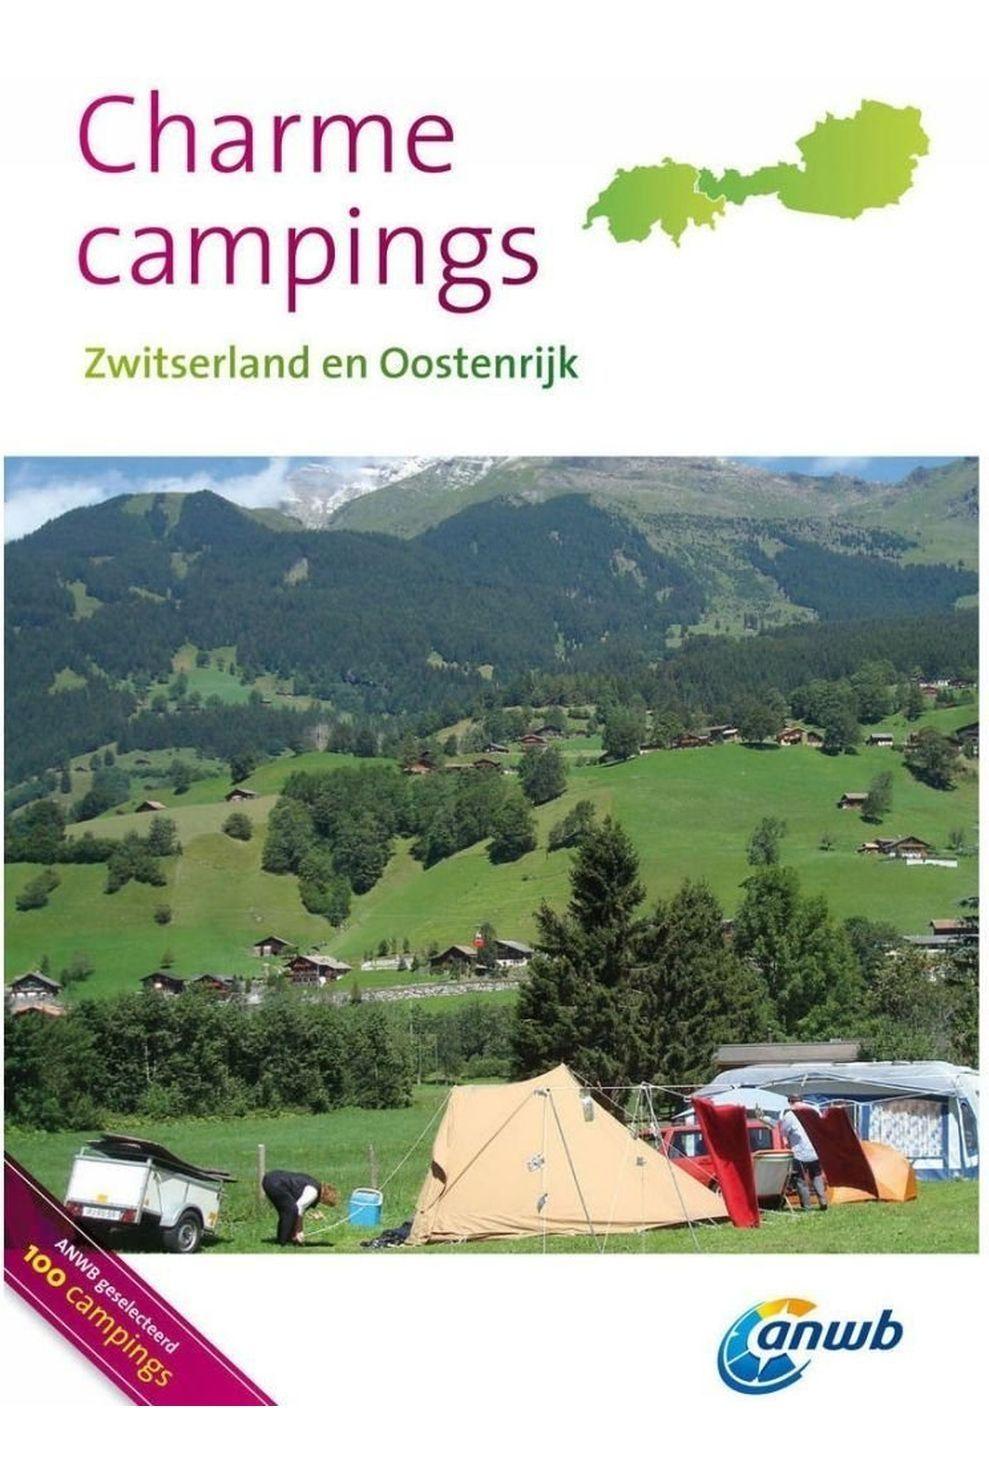 ANWB Reisgids Charmecampings Oostenrijk, Zwitserland - 2014